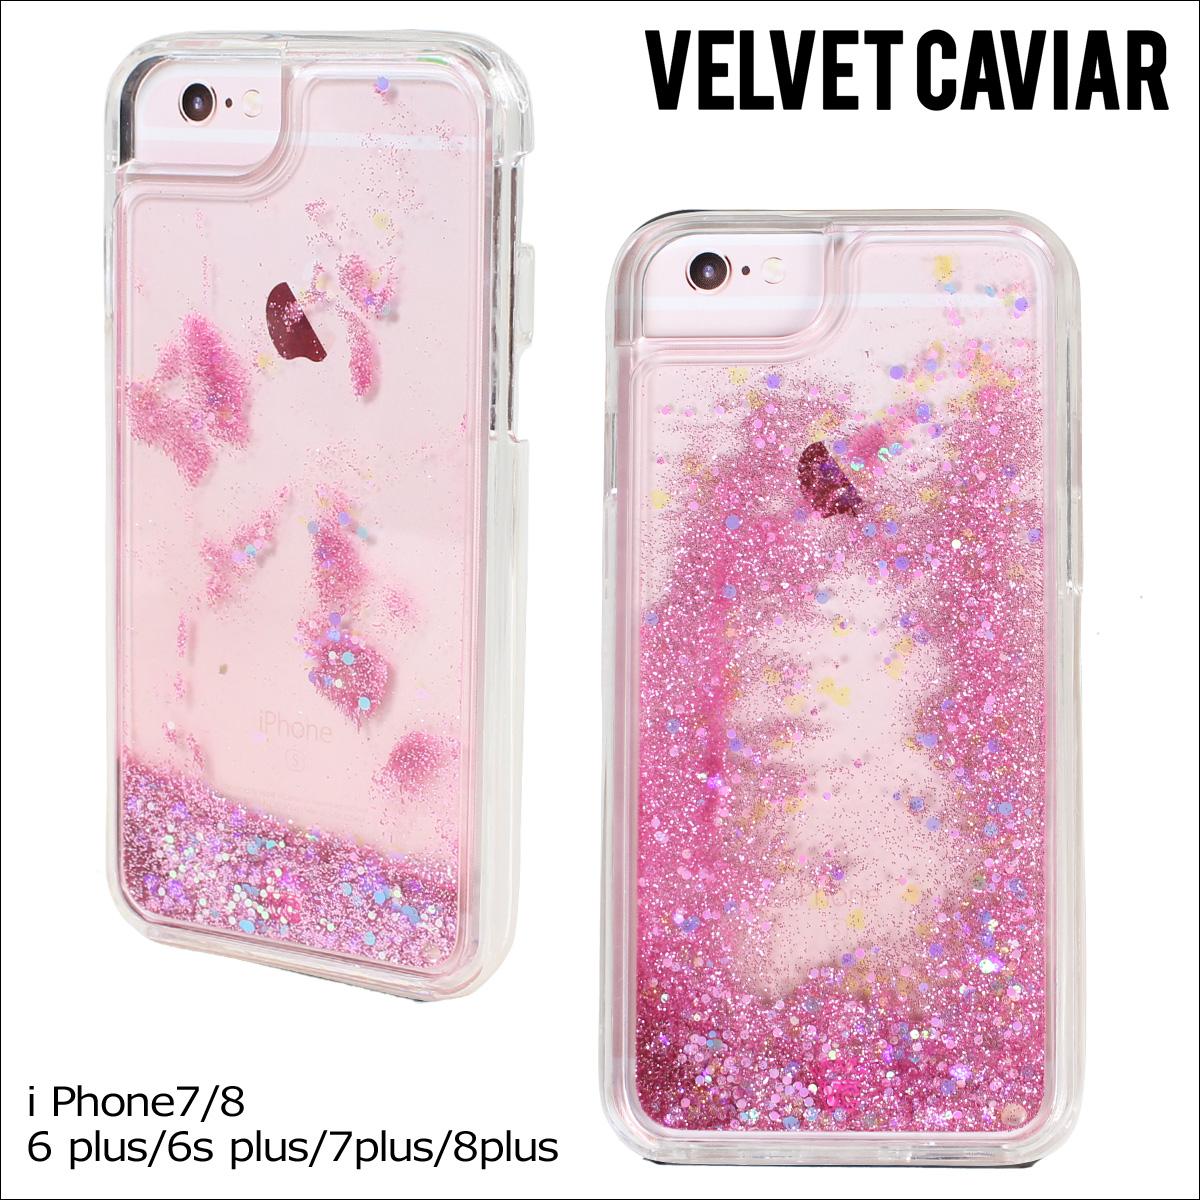 Velvet Caviar ヴェルヴェット キャビア iPhone8 SE 7 Plus 6s 6 ケース スマホ 携帯 グリッター アイフォン アイフォーン ベルベット PI